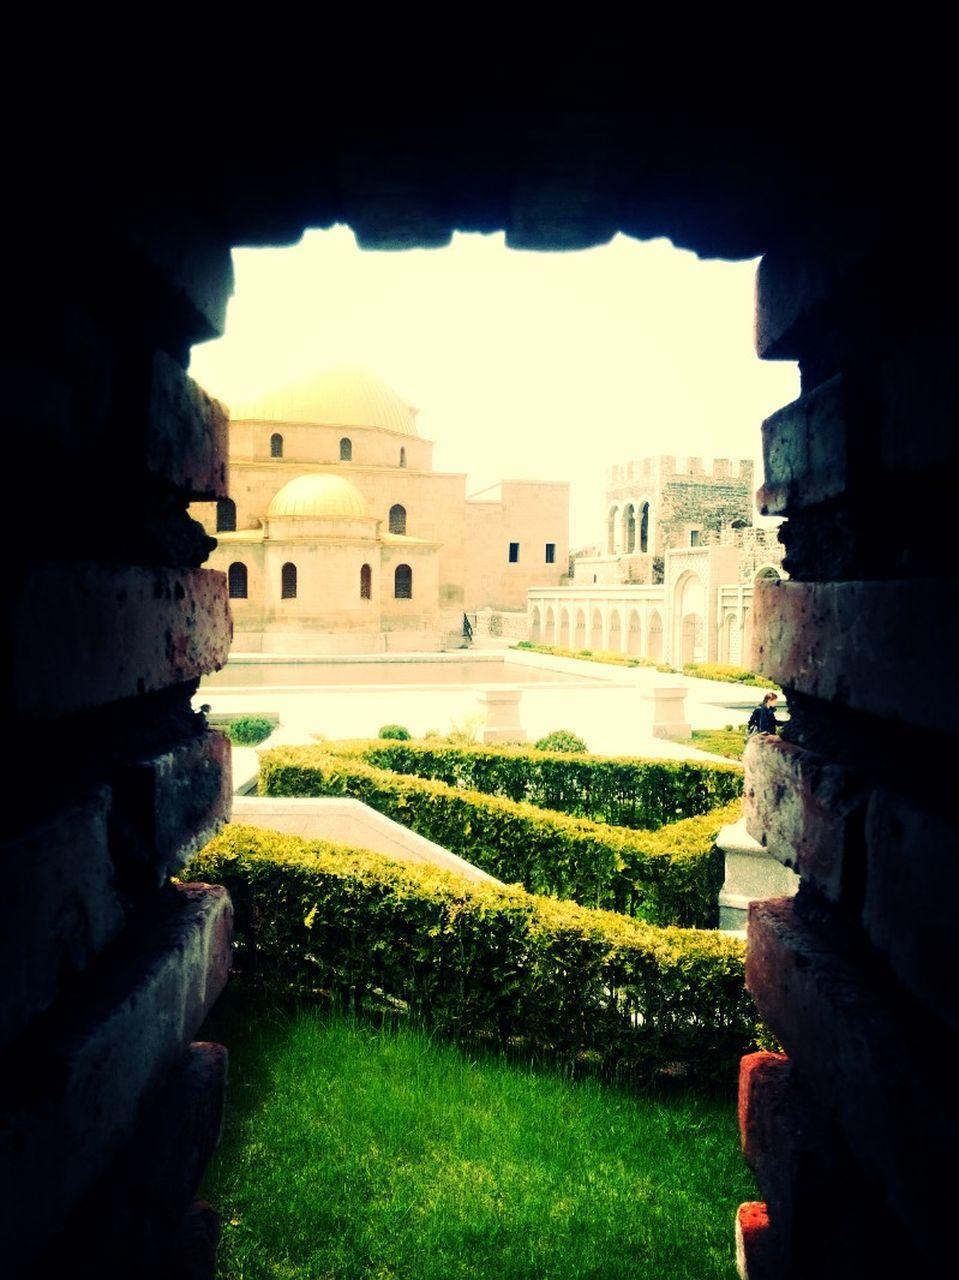 architecture, built structure, building exterior, history, castle, no people, day, outdoors, travel destinations, nature, sky, grass, ancient civilization